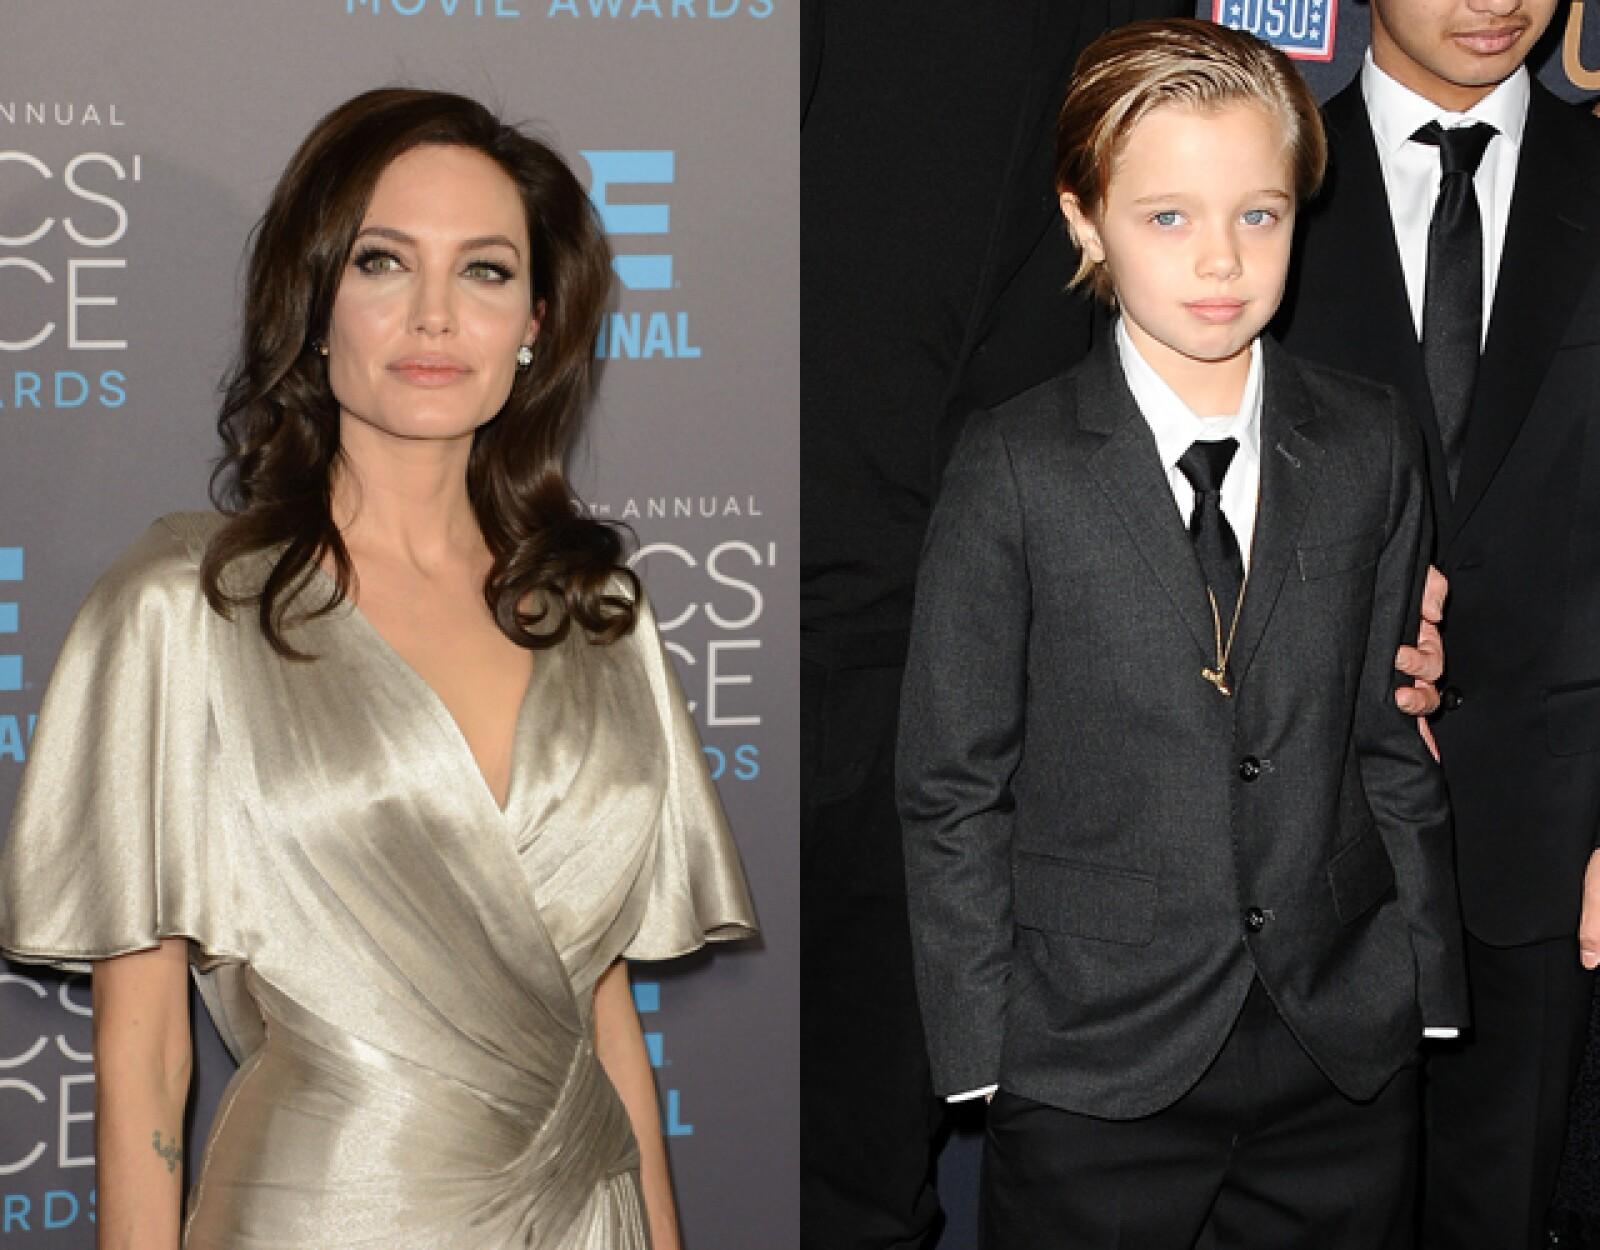 Shiloh Jolie Pitt, hija de Angelina Jolie y Brad Pitt.